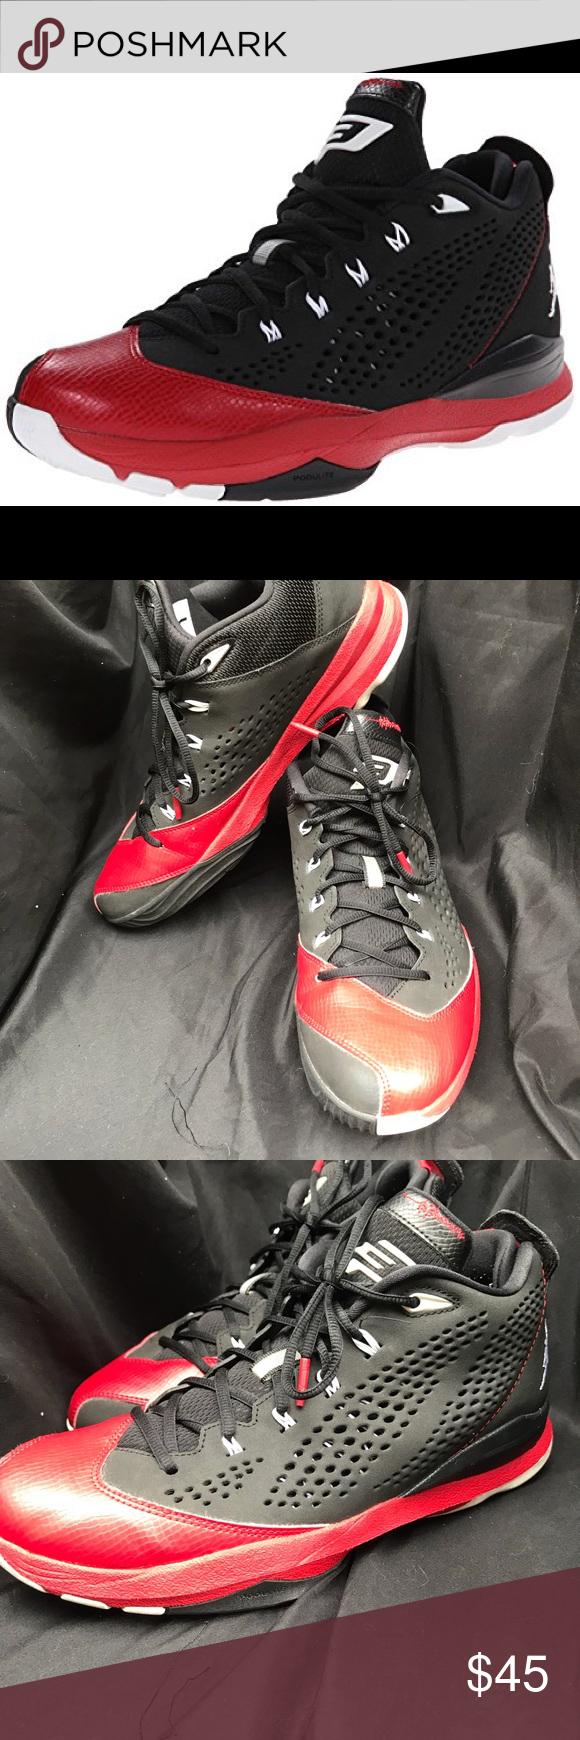 747401fad4ac04 Nike Chris Paul Jordan Basketball shoes! Worn once Nike air Jordan Chris  Paul VII Black White Red Basketball Shoes! Worn once. No visible signs of  wear.